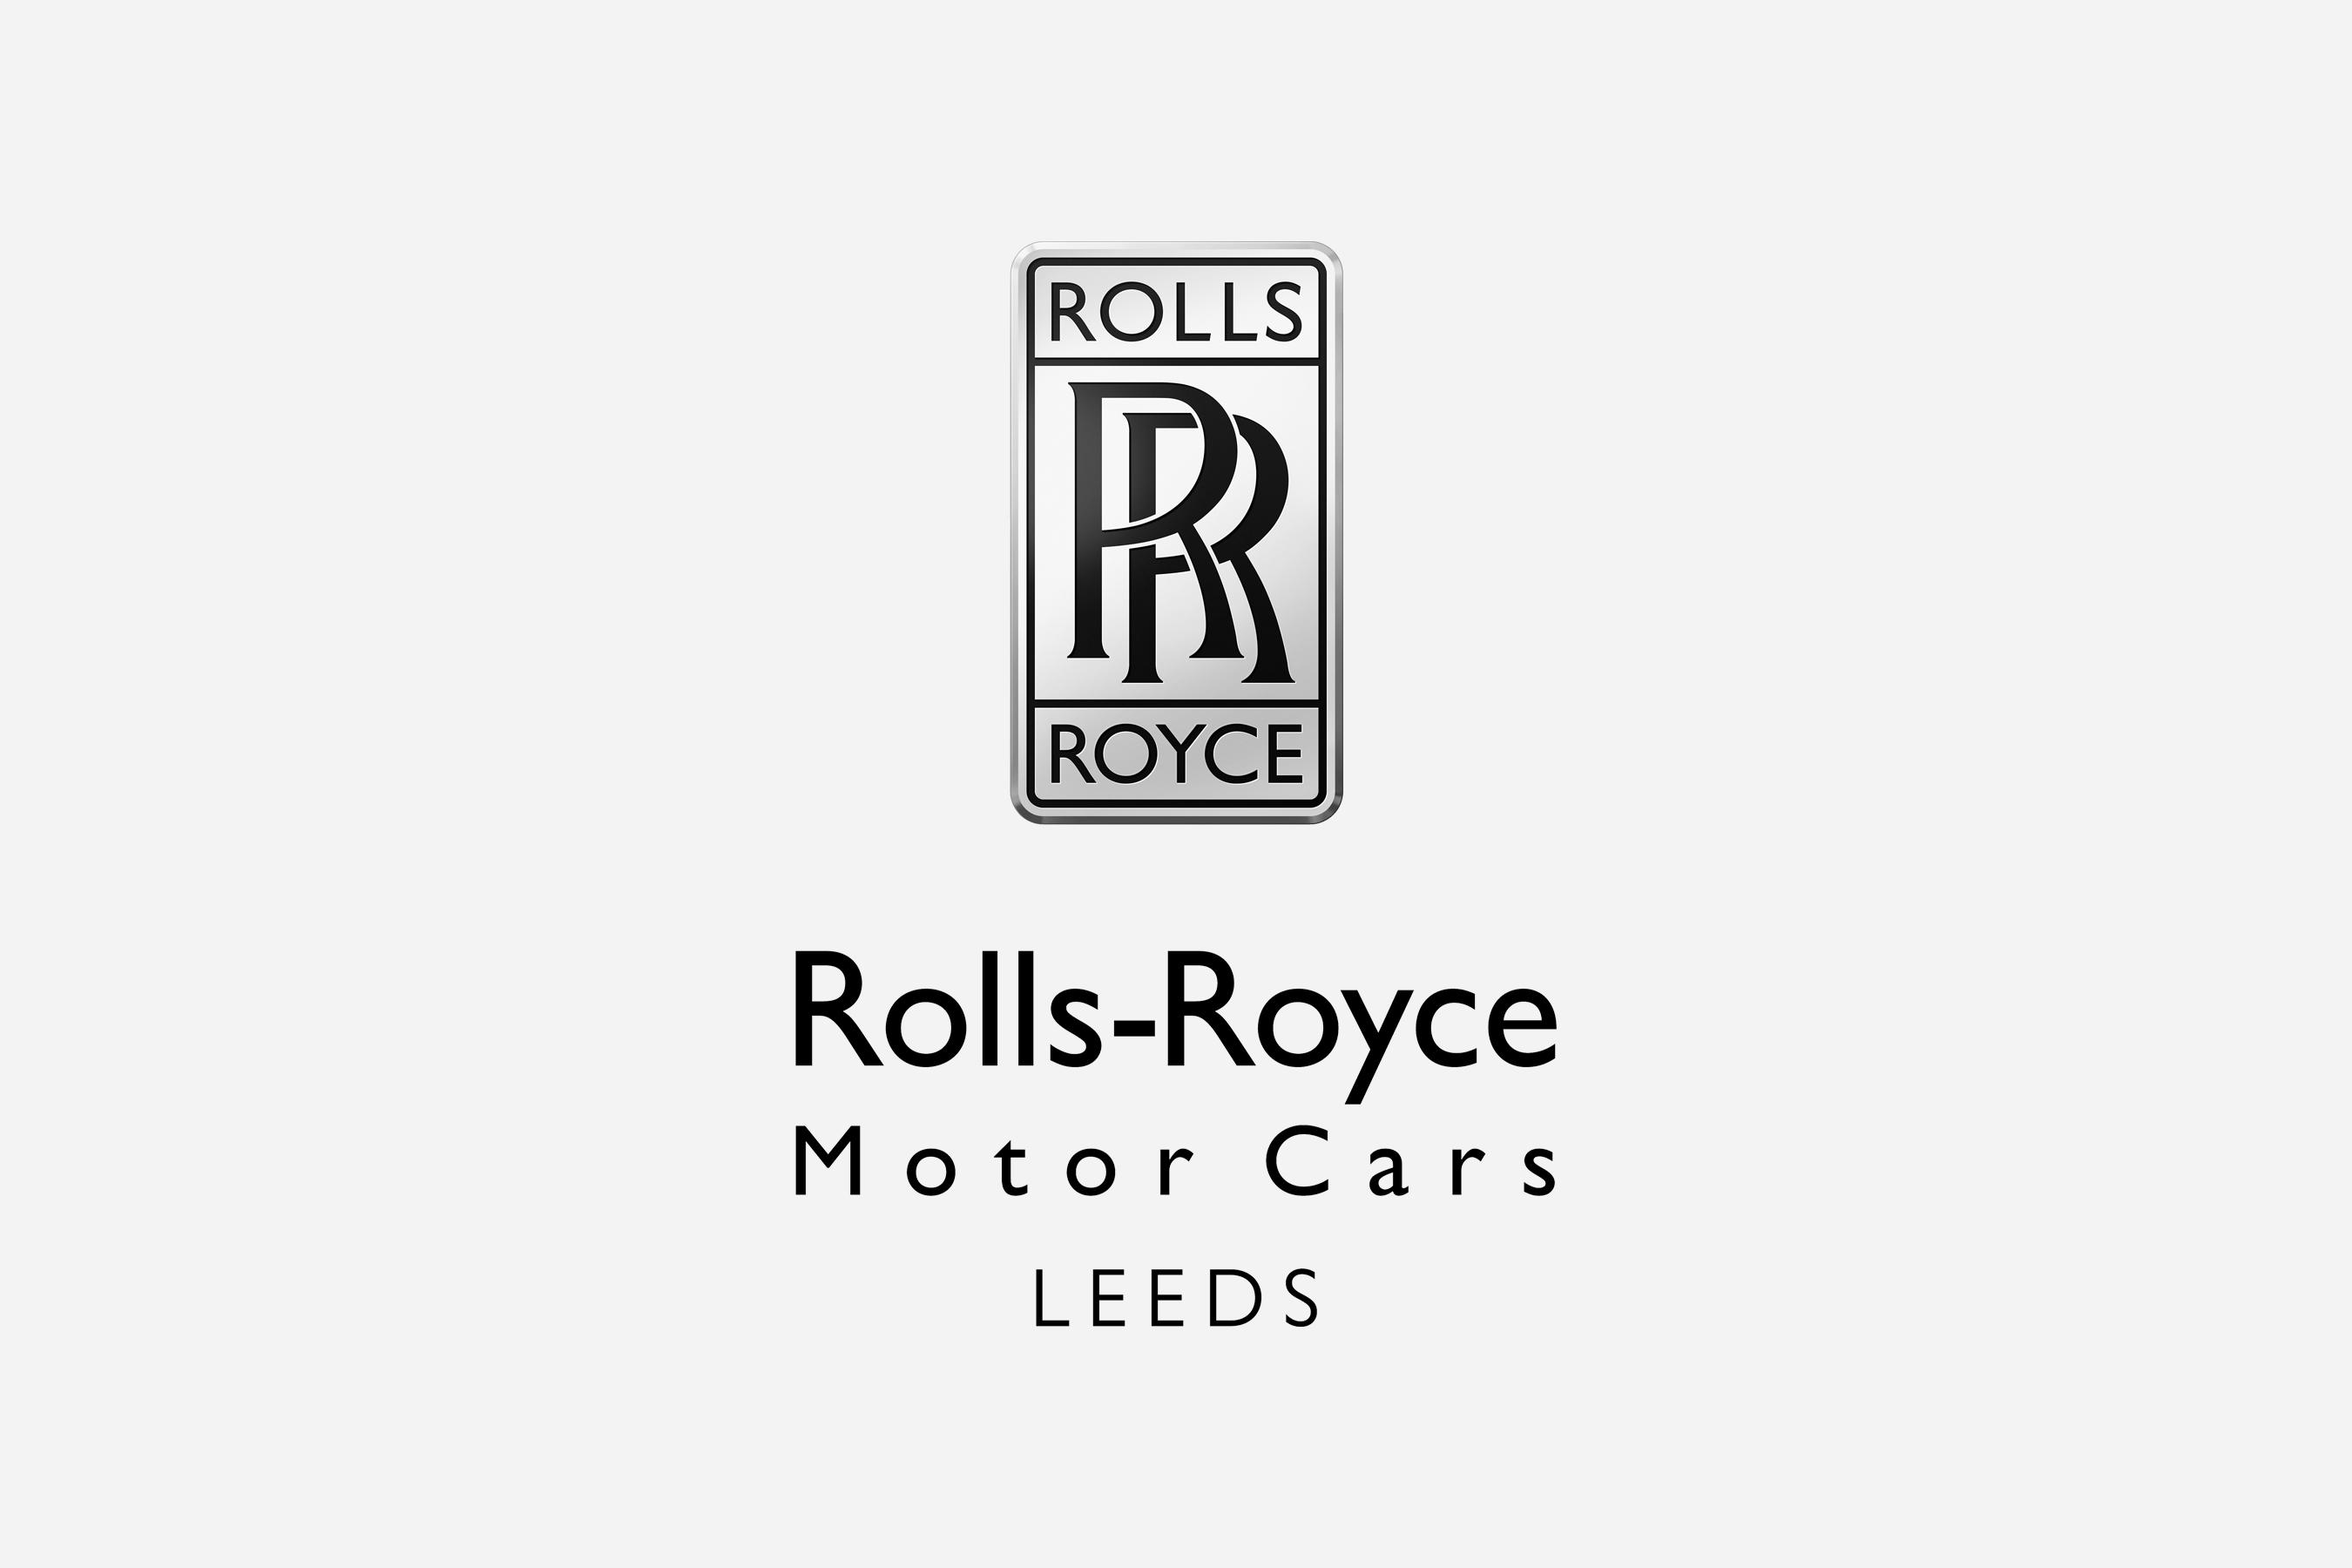 rr-motor-cars-leeds